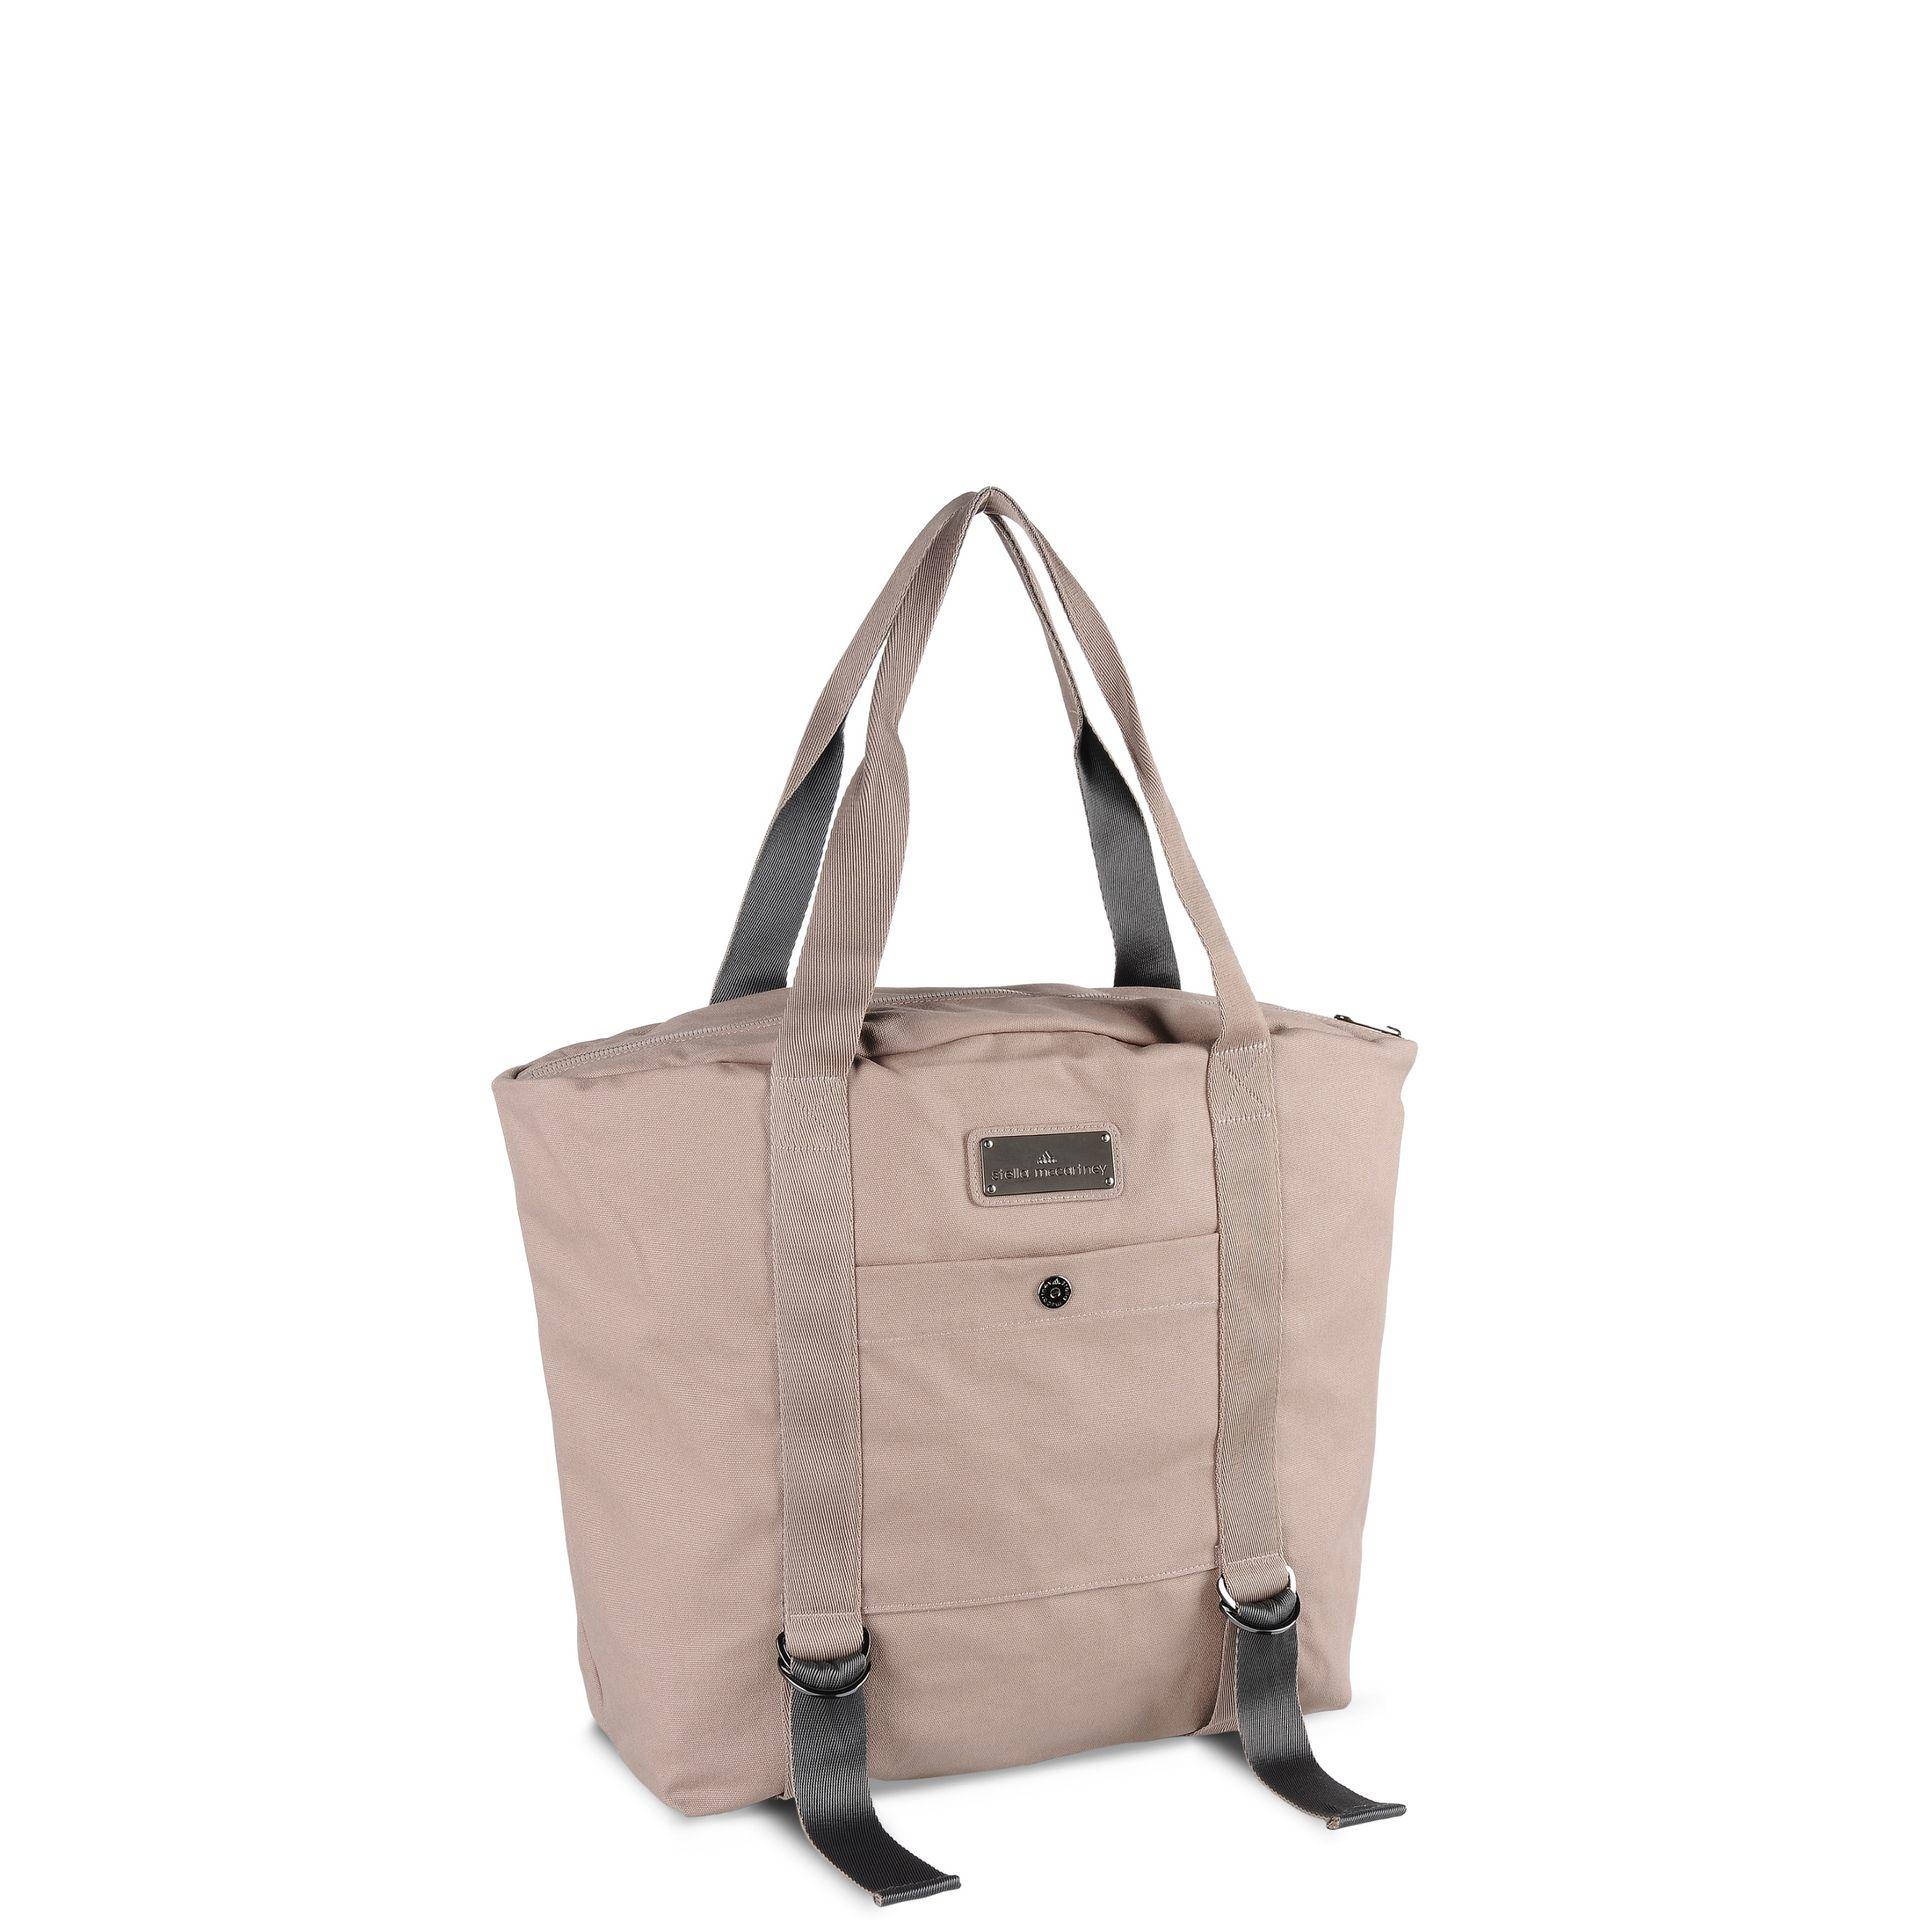 Lyst - adidas By Stella McCartney Cotton Yoga Bag in Natural 51859c8891